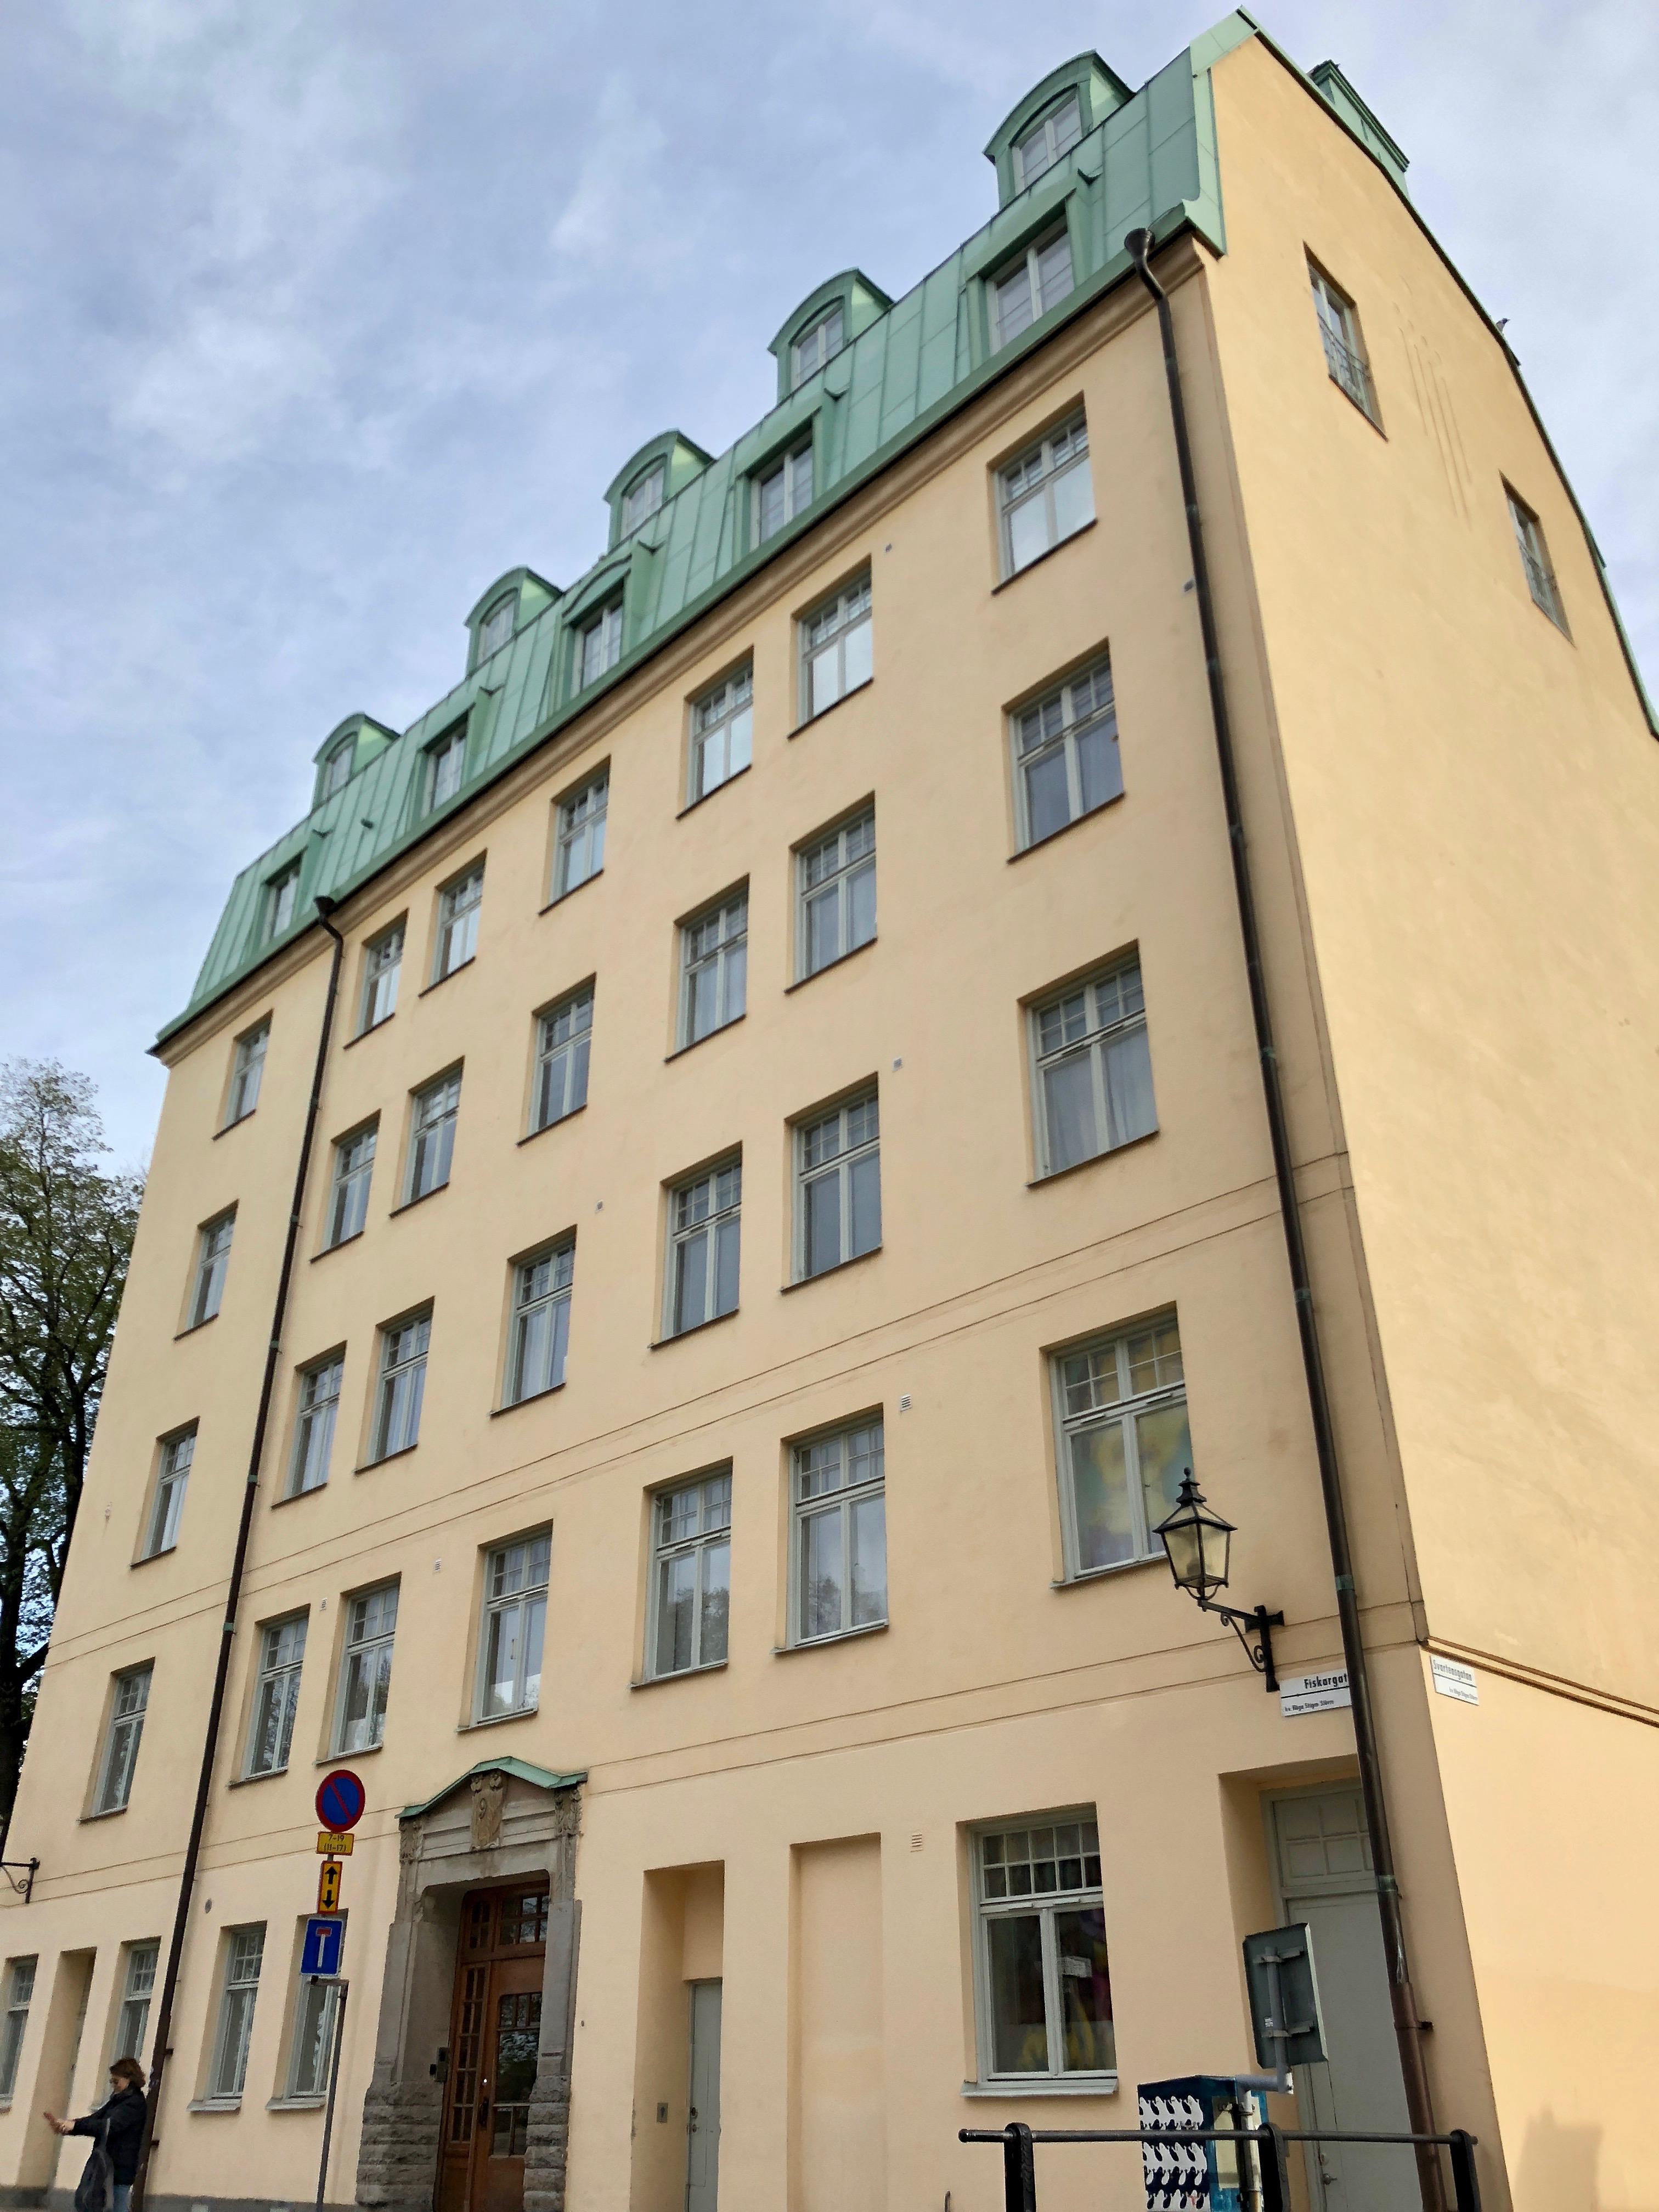 File Lisbeth Salander S Apartment On The Top Floor In Södermalm 30358511007 Jpg